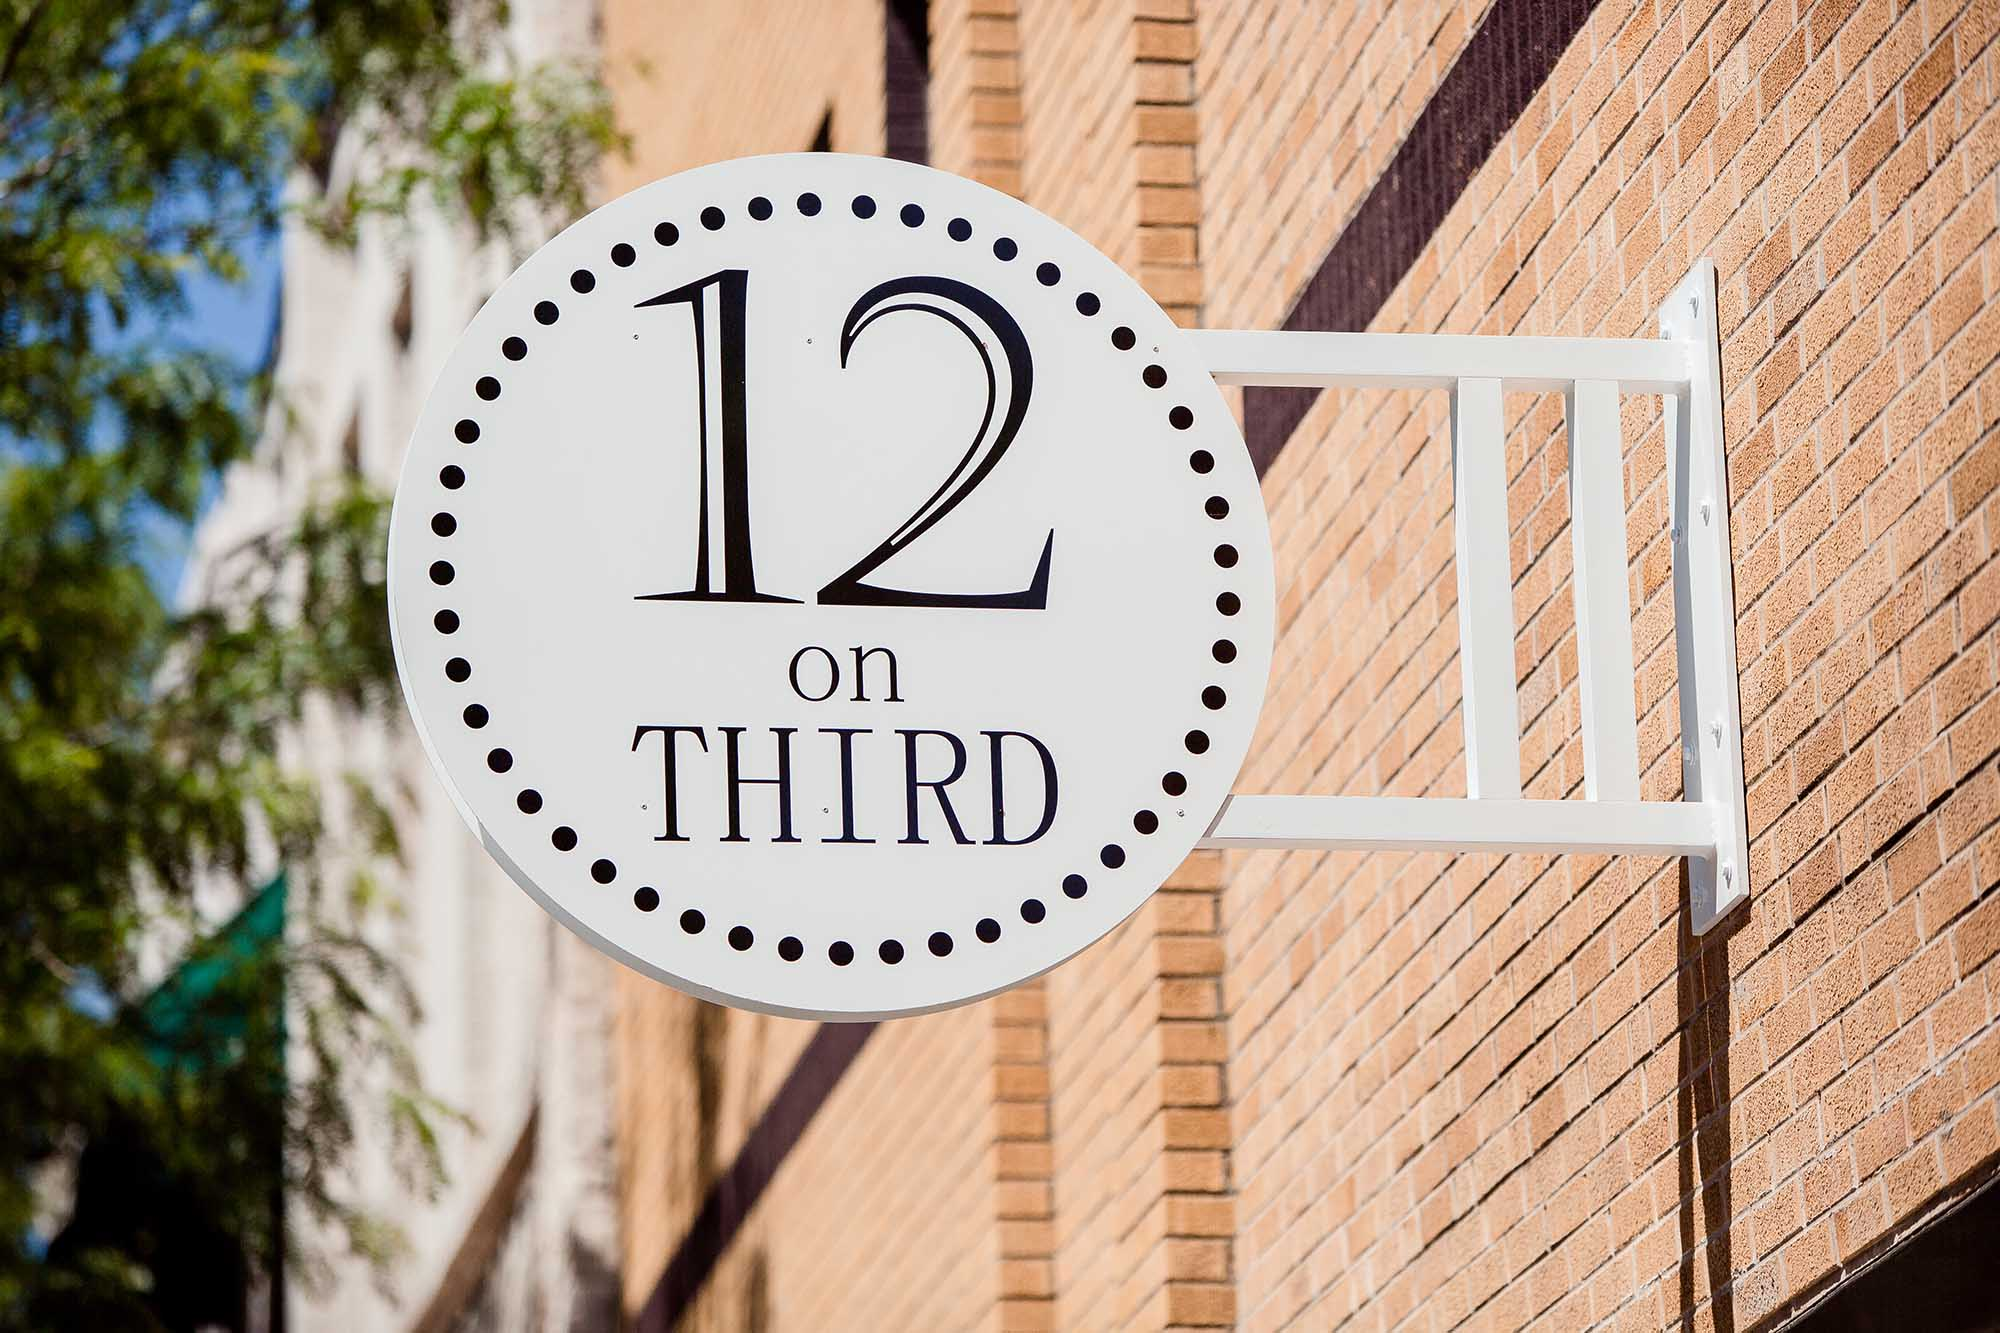 12 on Third Street